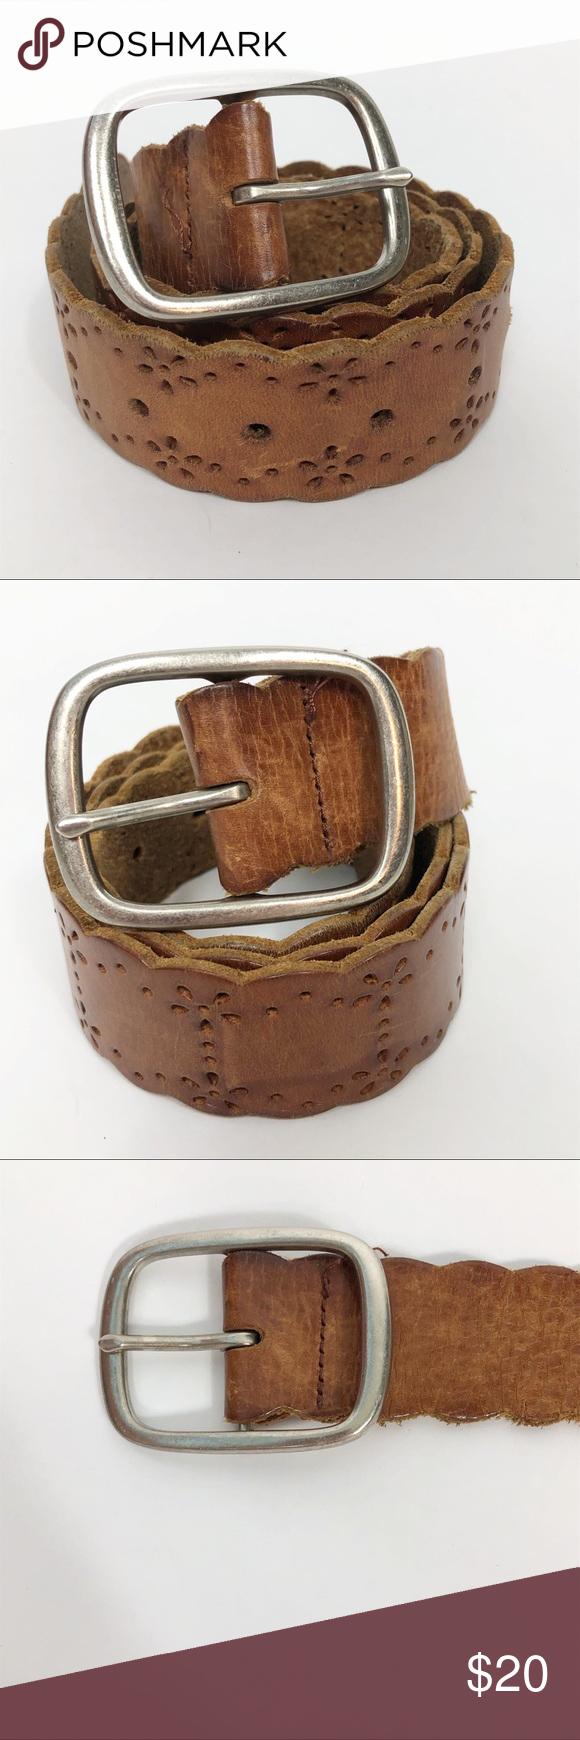 Aeropostale Tooled Leather Belt Cognac Leather Leather Tooling Aeropostale